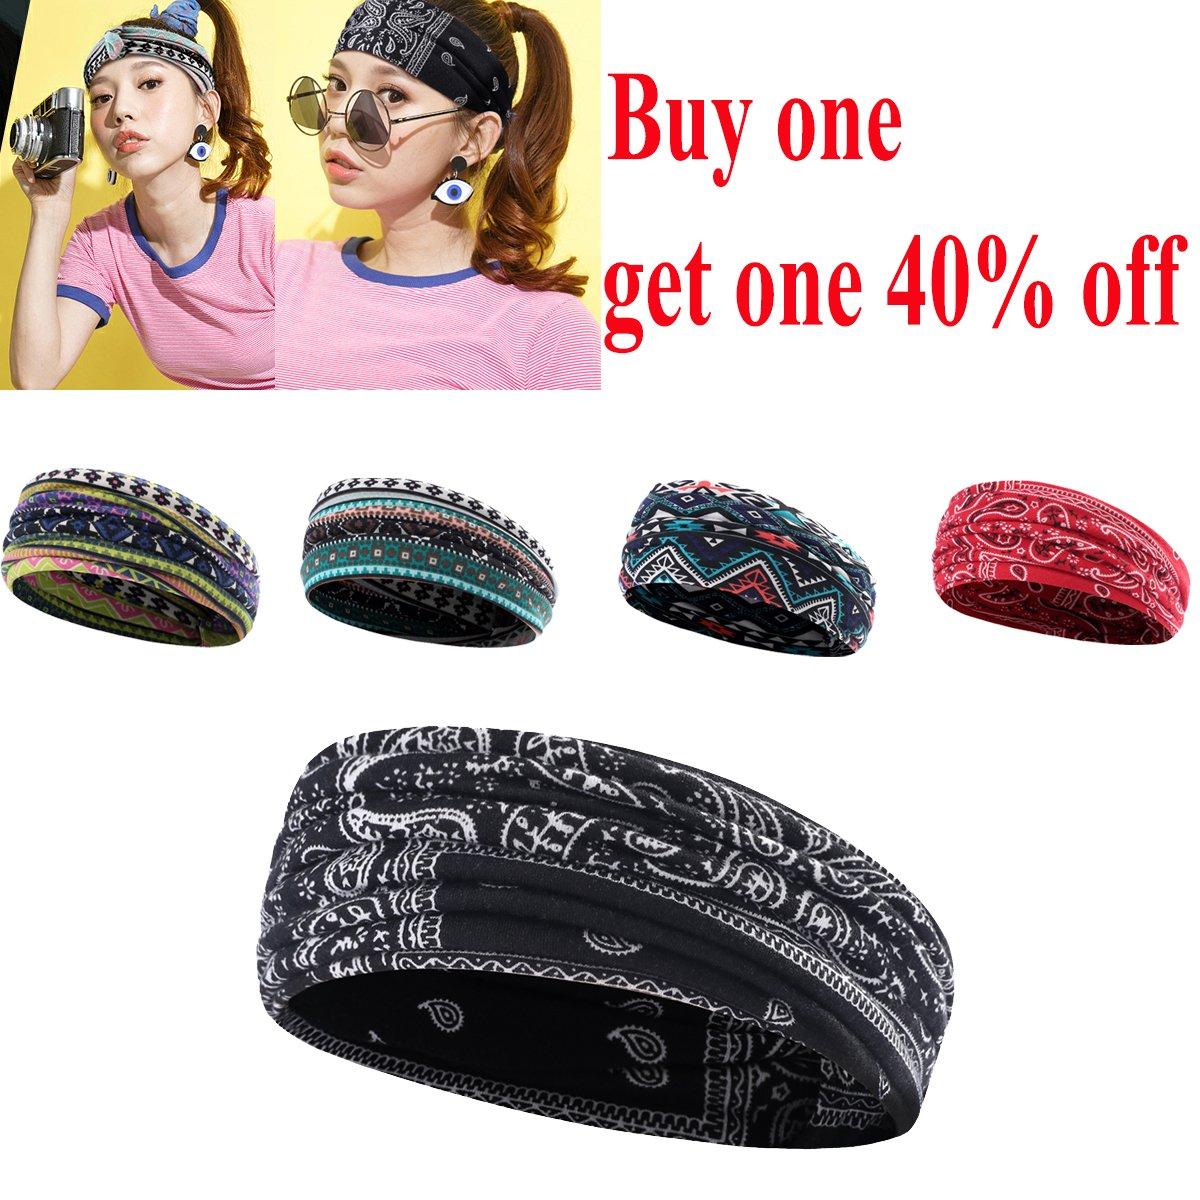 b400bd0f5e87 Non-Slip Classical Women Headband UHEREBUY Moisture Wicking Head Wrap Multi- Style Adjust Yoga Stretchy Workout Sweatband Headband Hair Band Turban  Headband